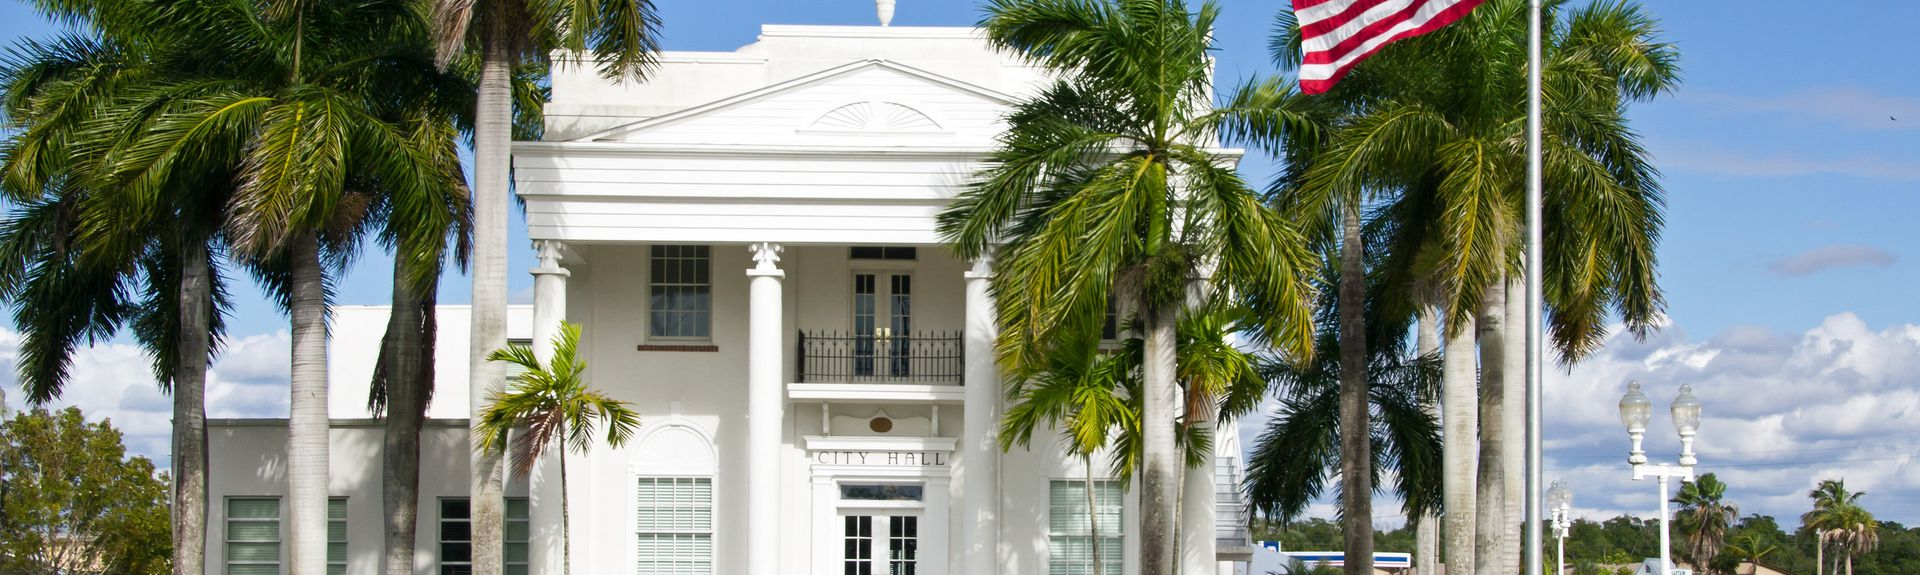 Everglades City, Florida, United States of America